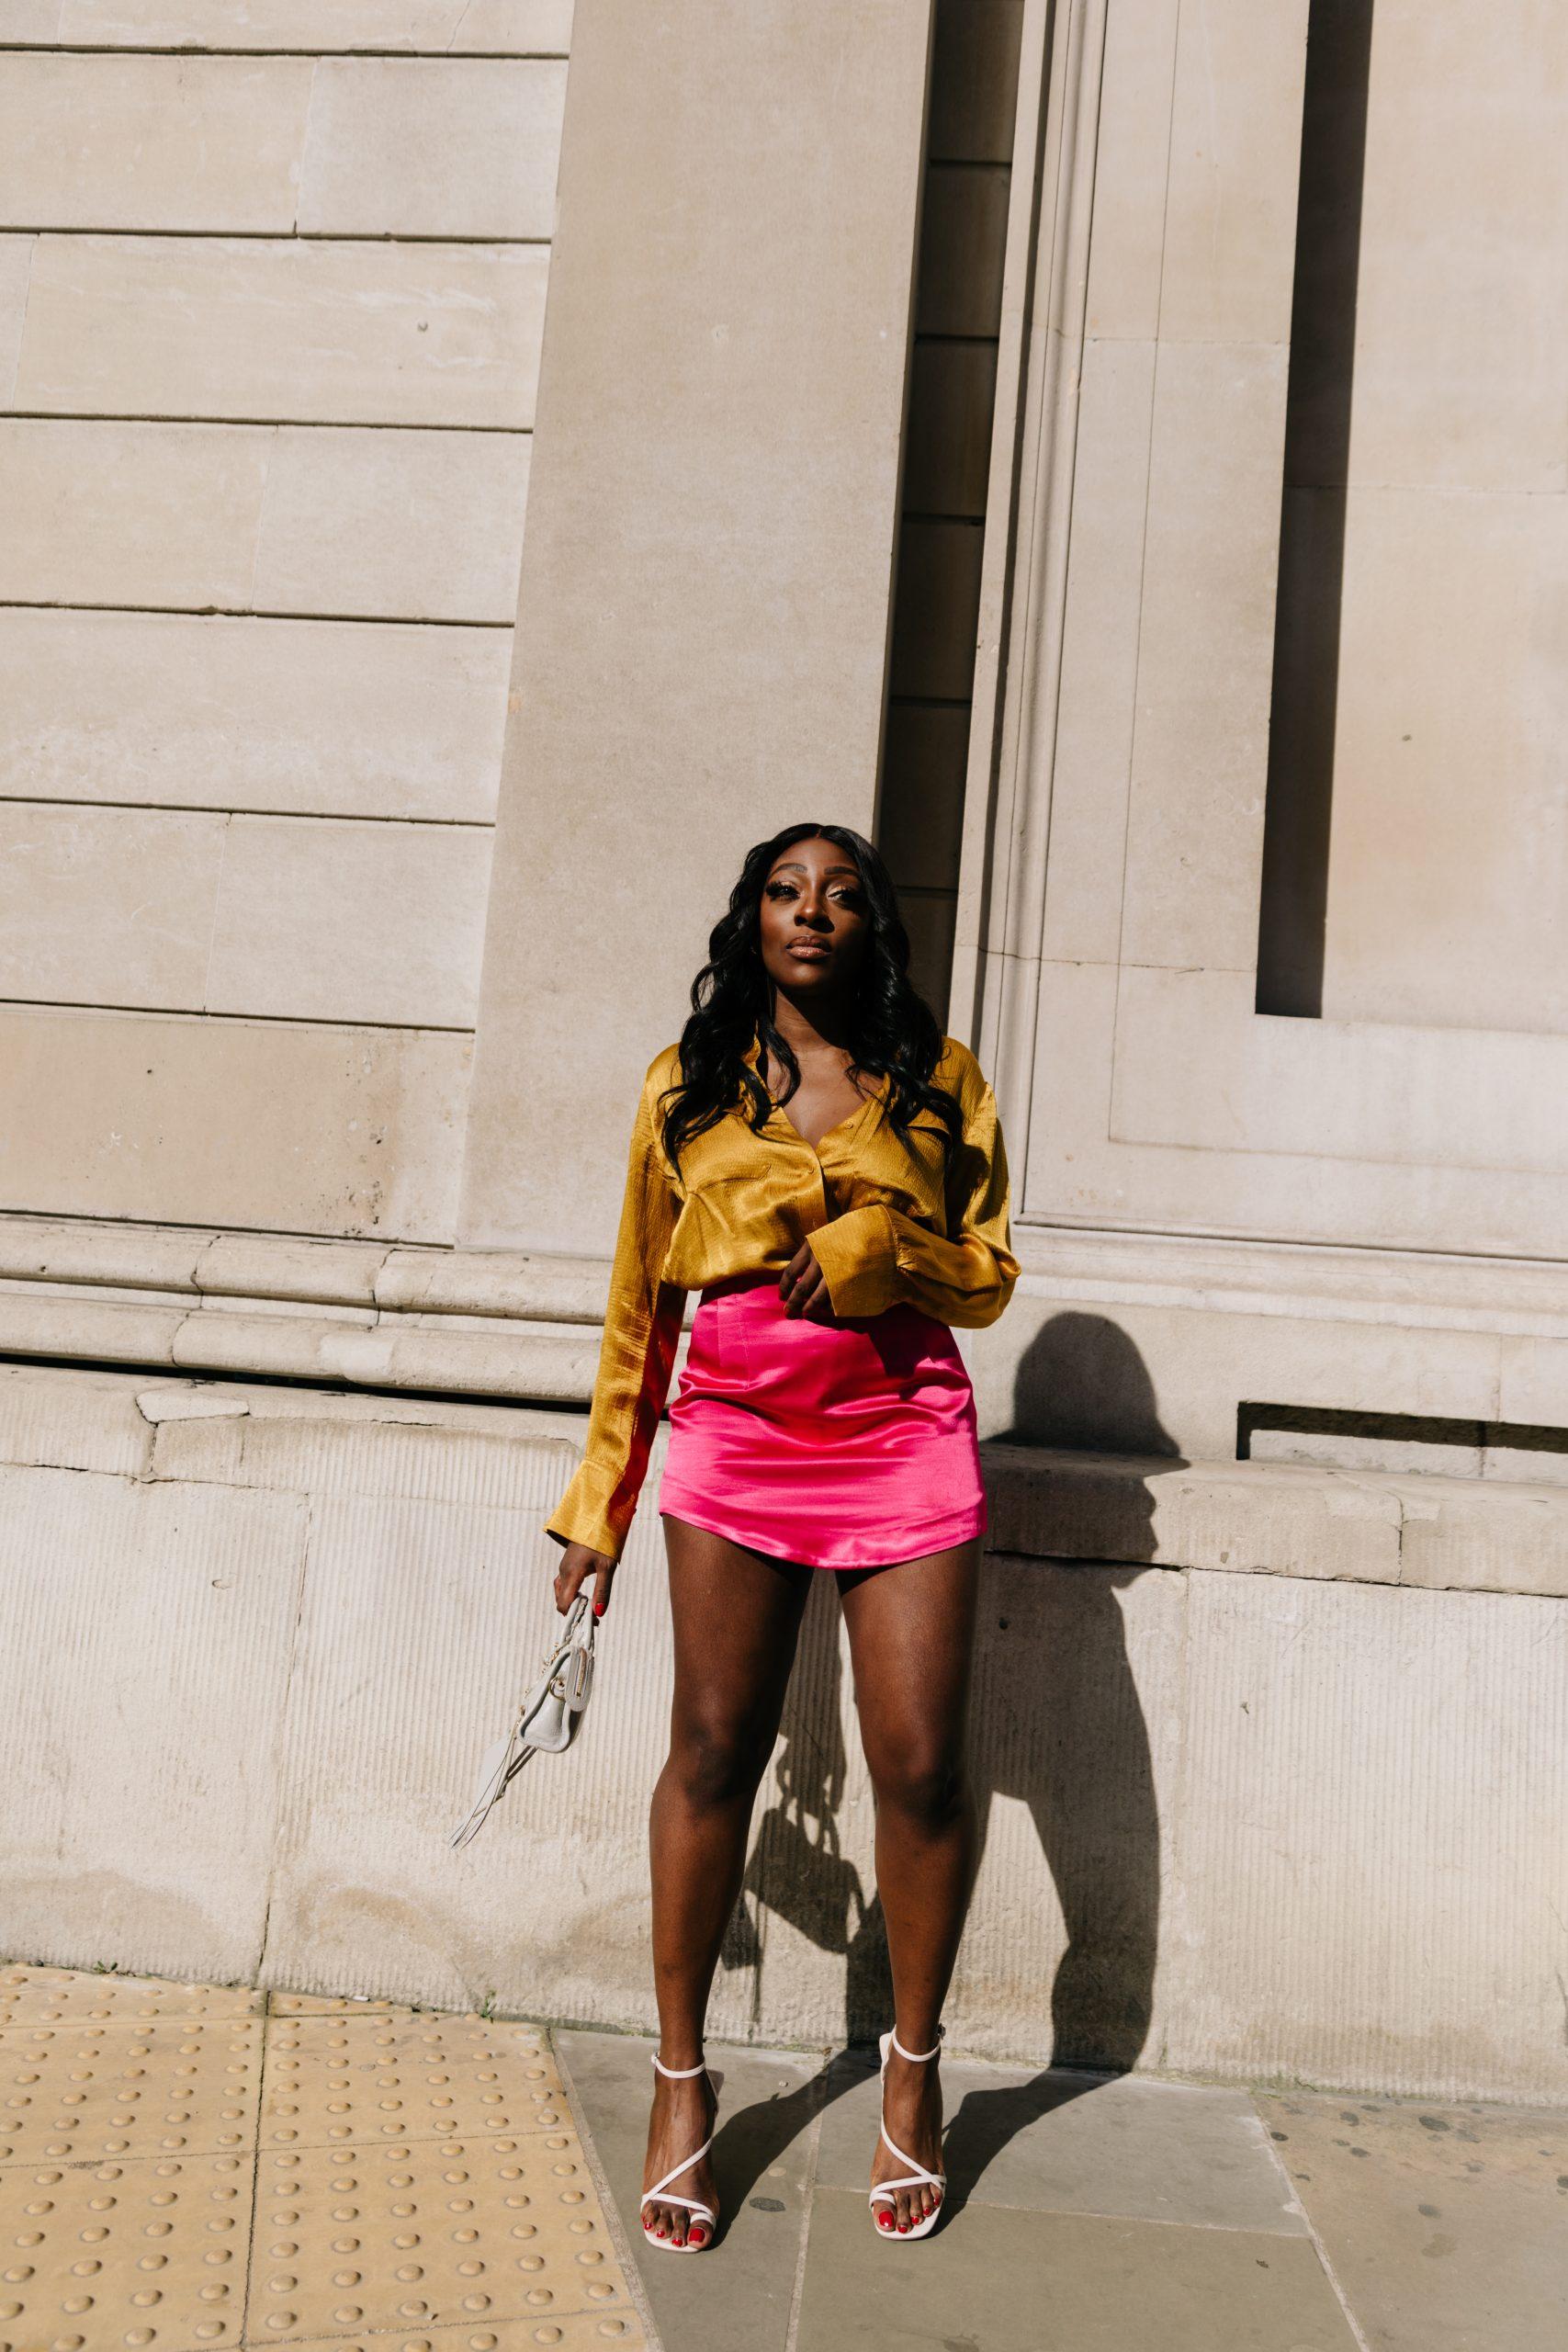 Satin-finish mini skirt Zara - Top shop sandals 3 -Tasha Antwi